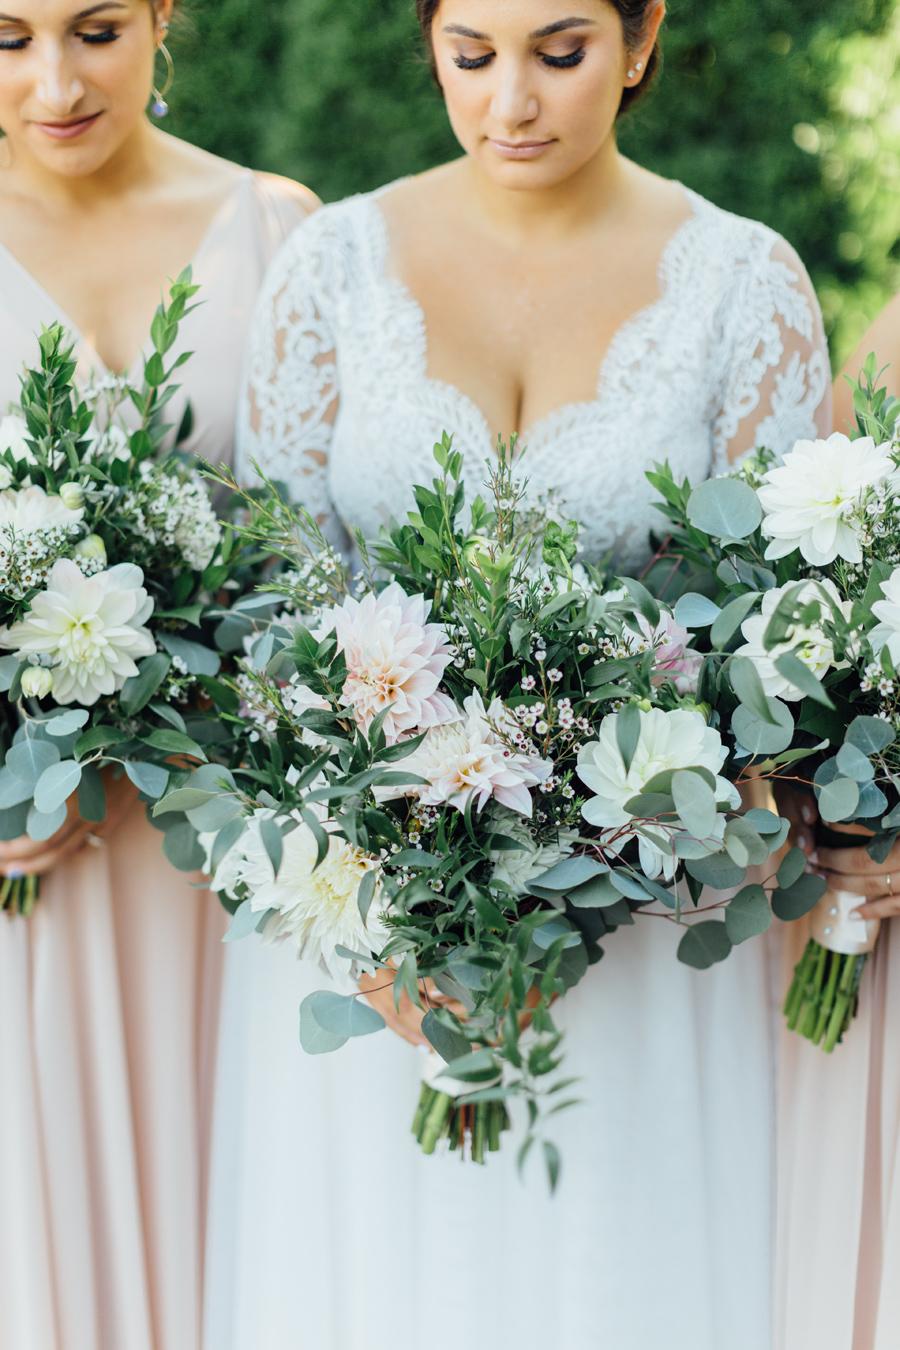 the-inn-at-leola-wedding-lancaster-pennsylvania-wedding-photographer-rebeka-viola-photograhy (25).jpg